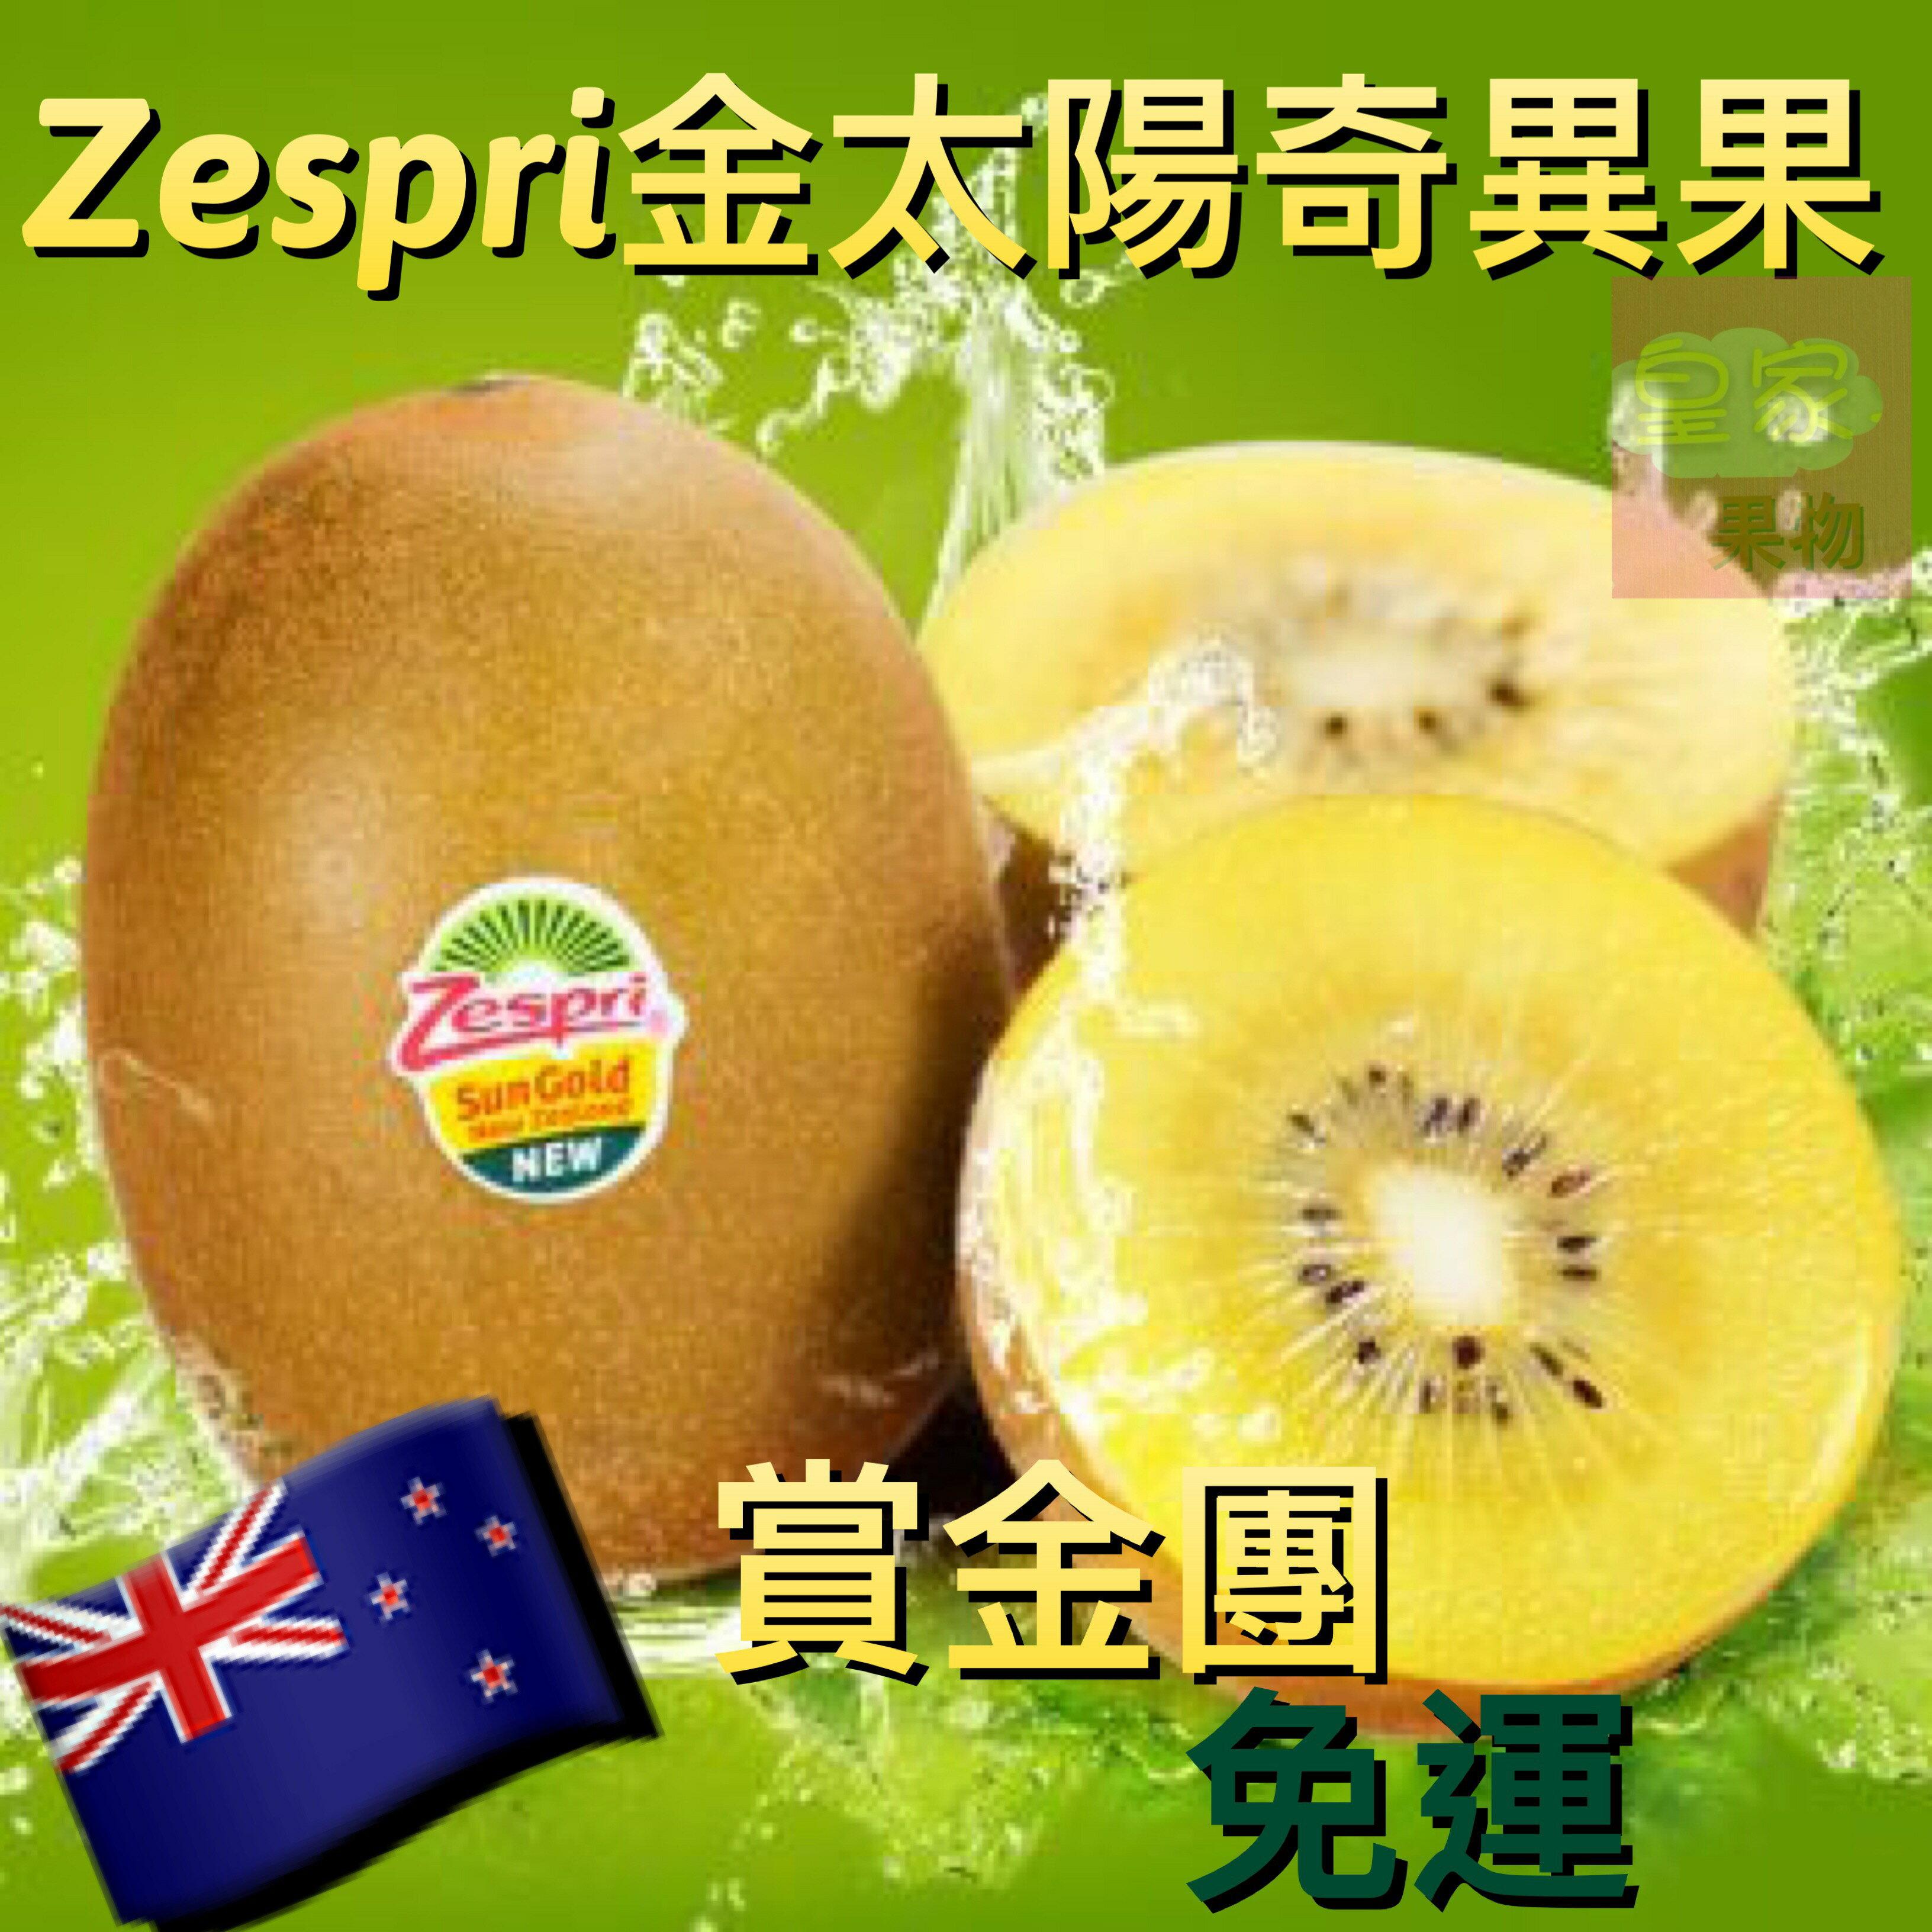 ZespriR 紐西蘭黃金SunGold奇異果【低溫免運】巨無霸18~22粒裝【皇家果物】